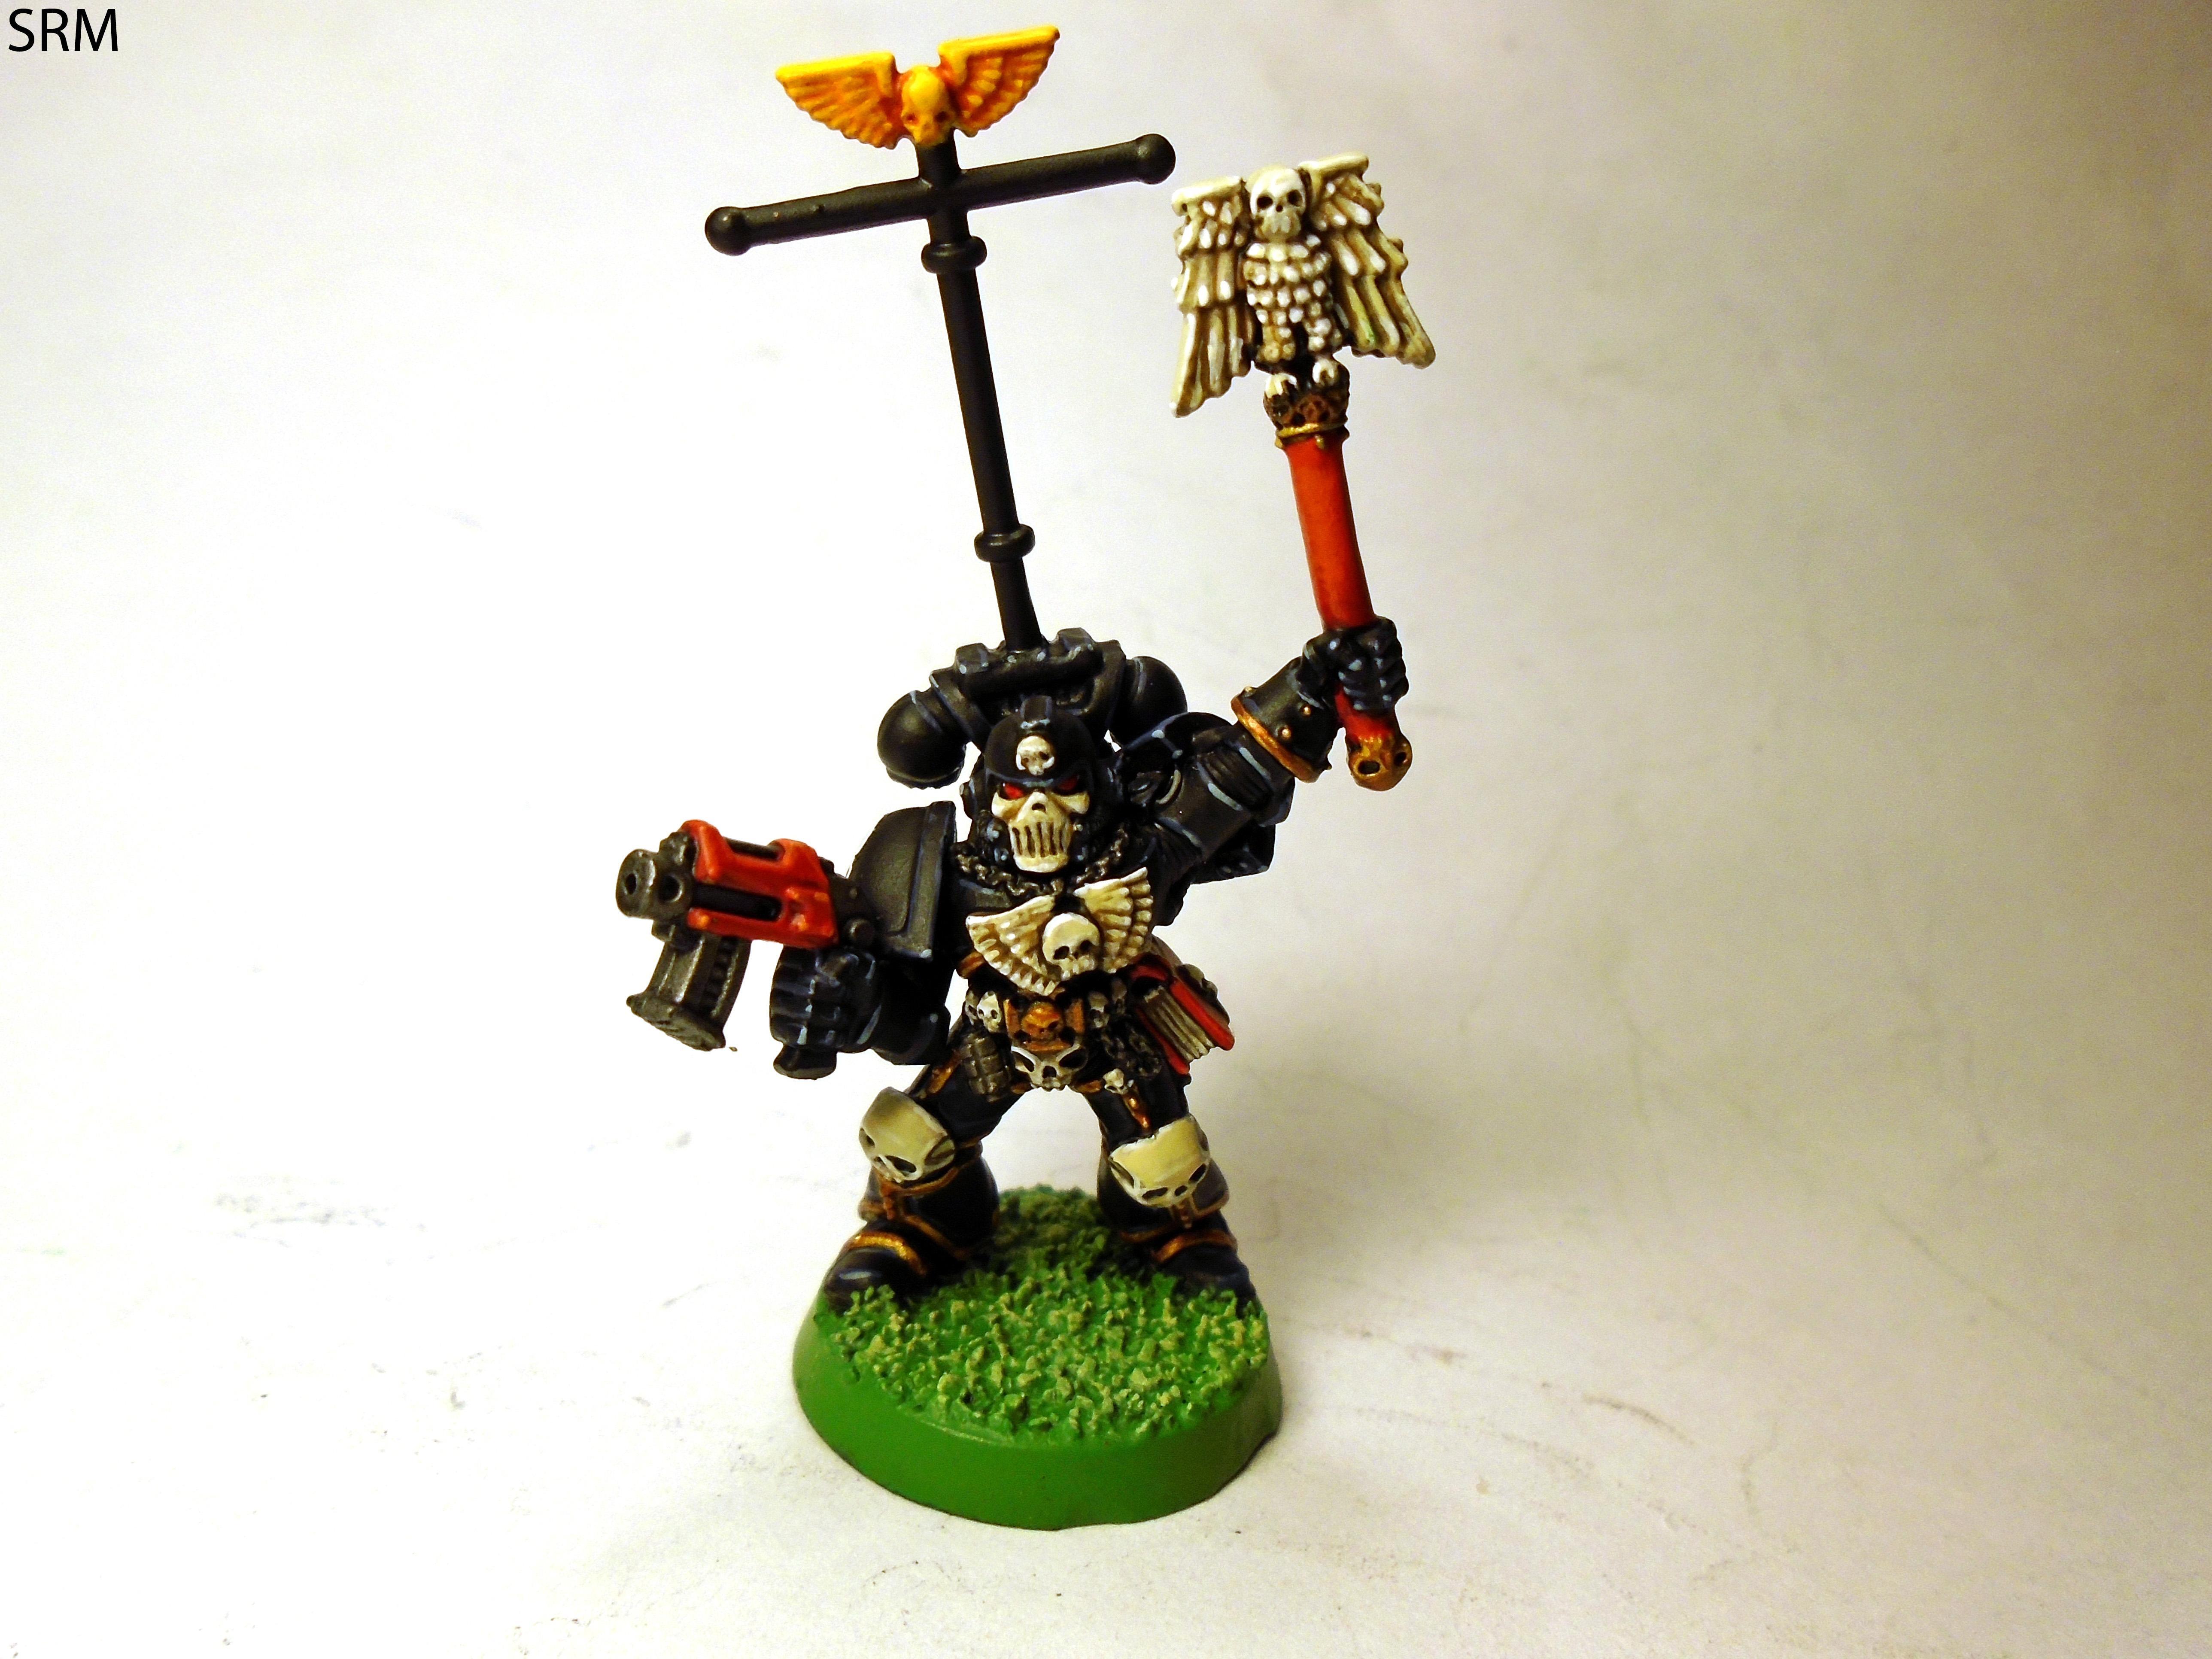 Chaplain, Infantry, Retro, Space Marines, Ultramarines, Warhammer 40,000